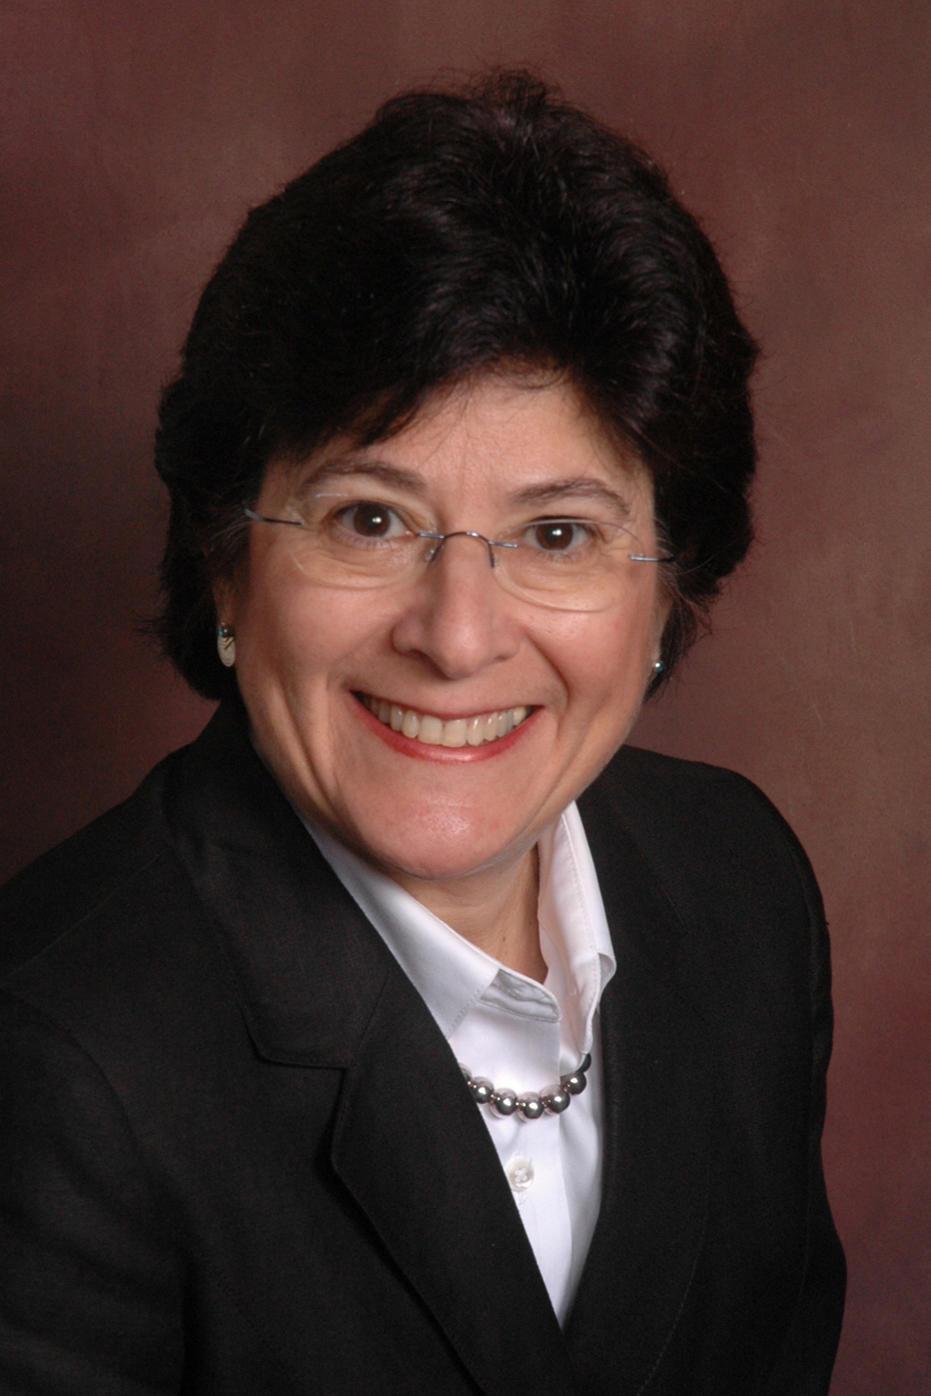 Arlene Donowitz, MD